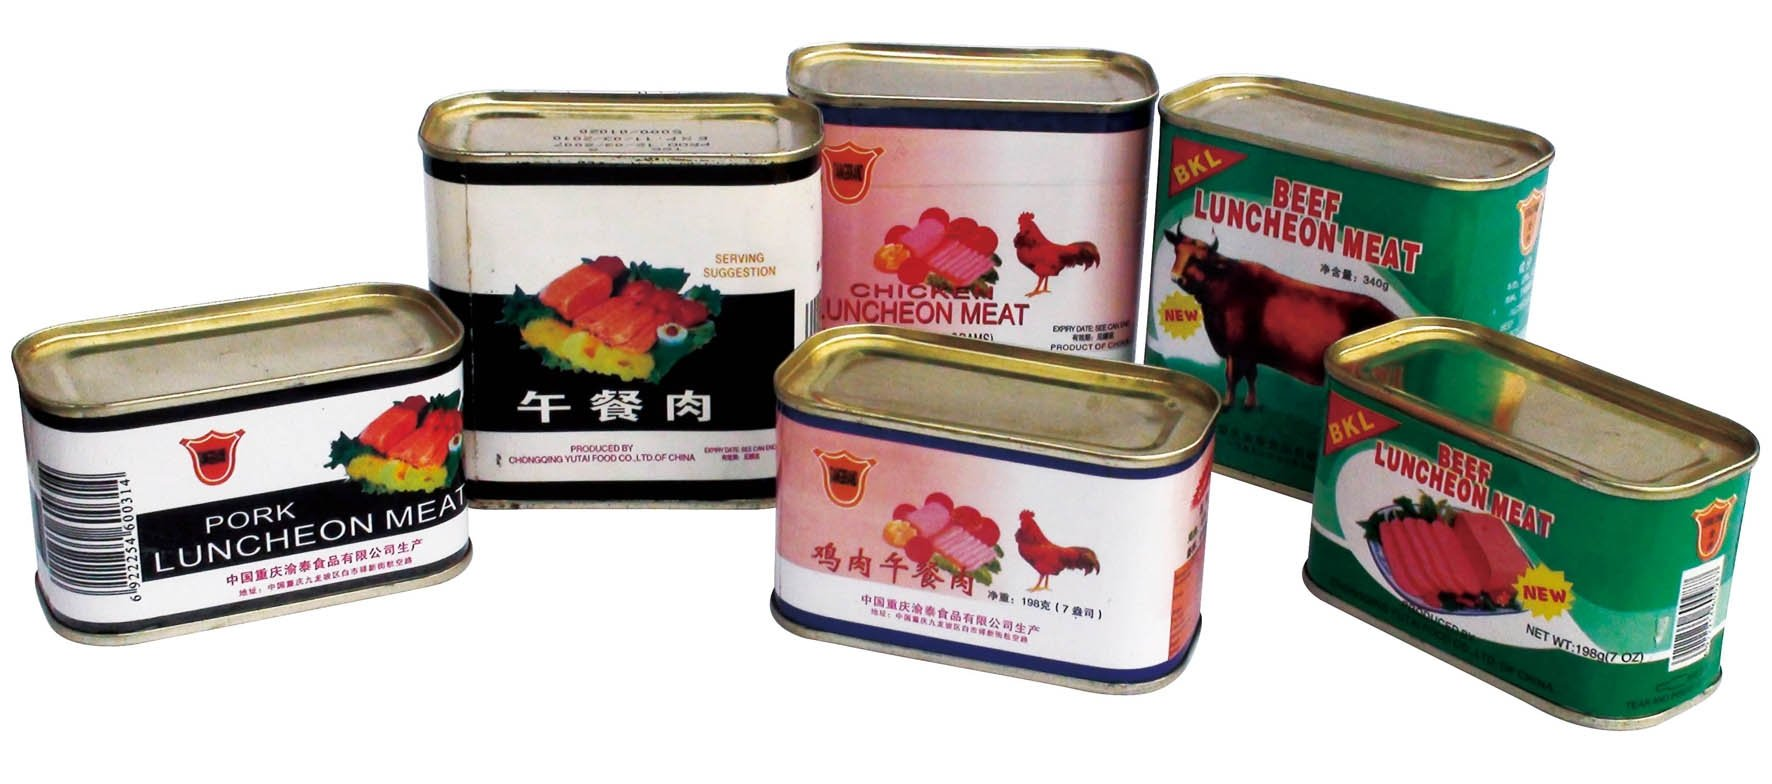 Foodstuff: Pork Luncheon Meat, Beef Luncheon Meat, Chicken Luncheon Meat